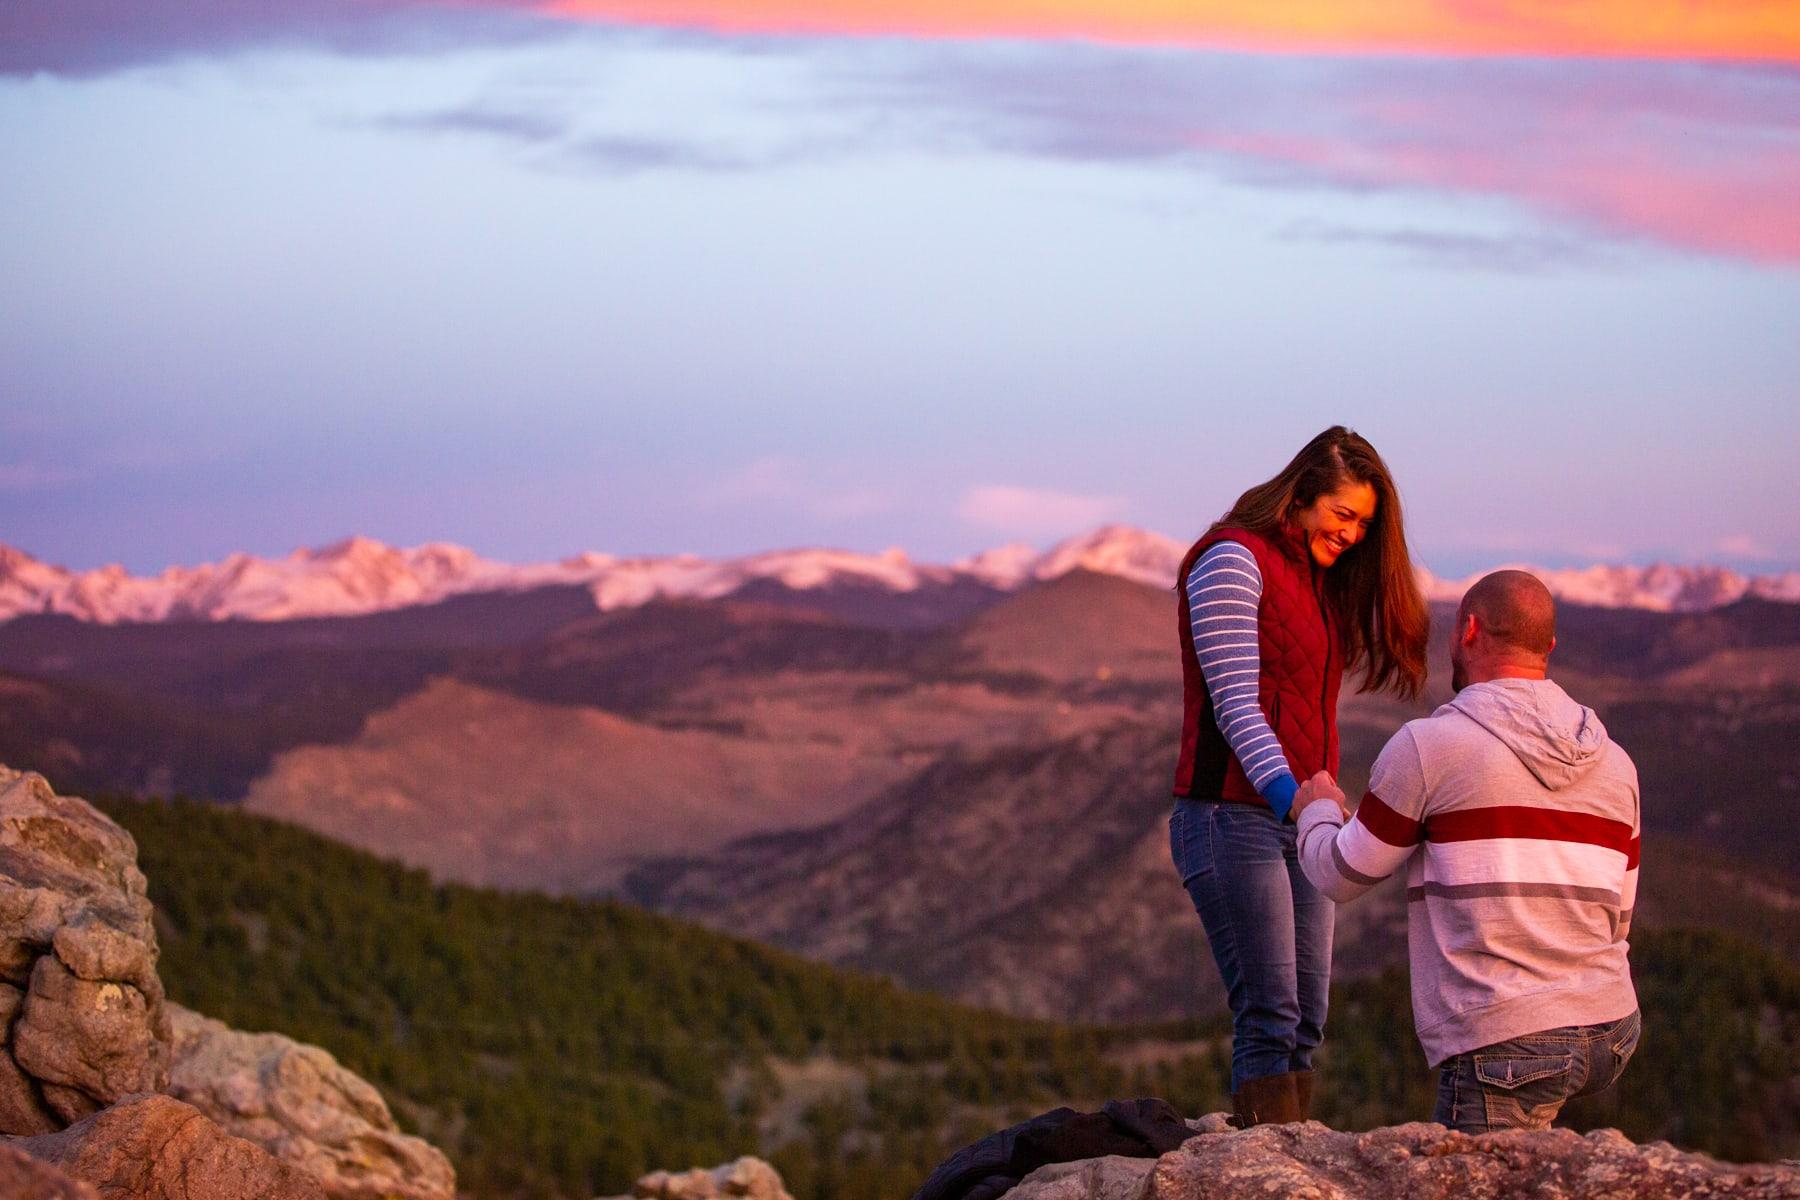 Colorado Mountain Proposal – Sunrise Proposal At Lost Gulch